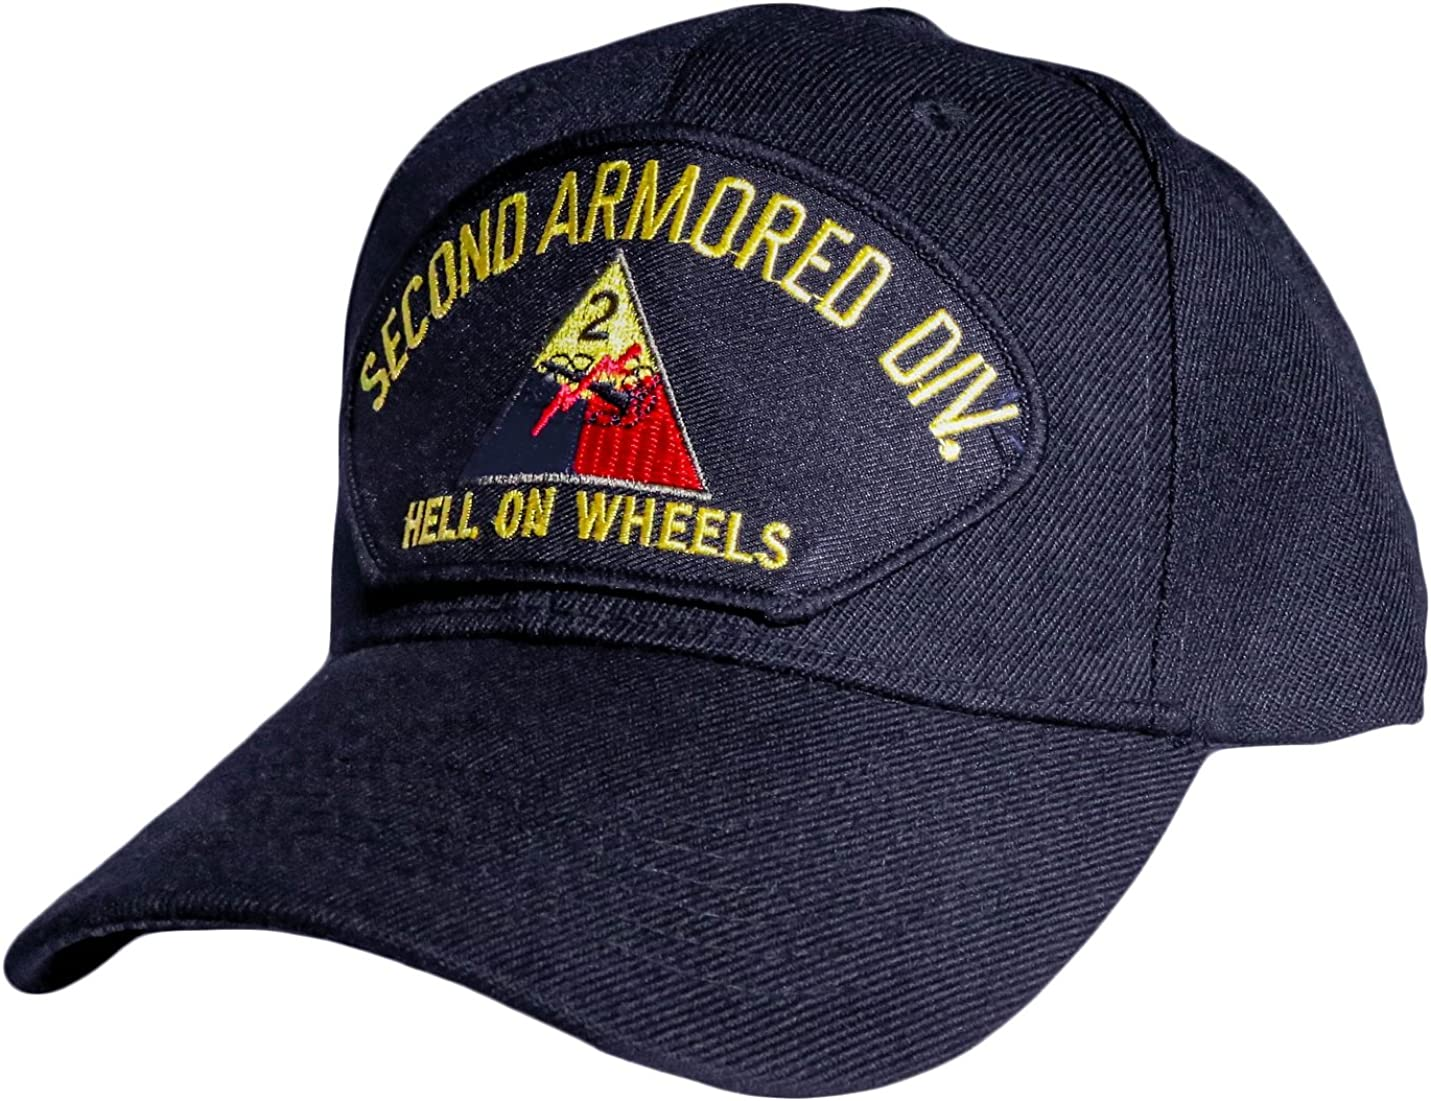 2nd Armored Division Cap Black